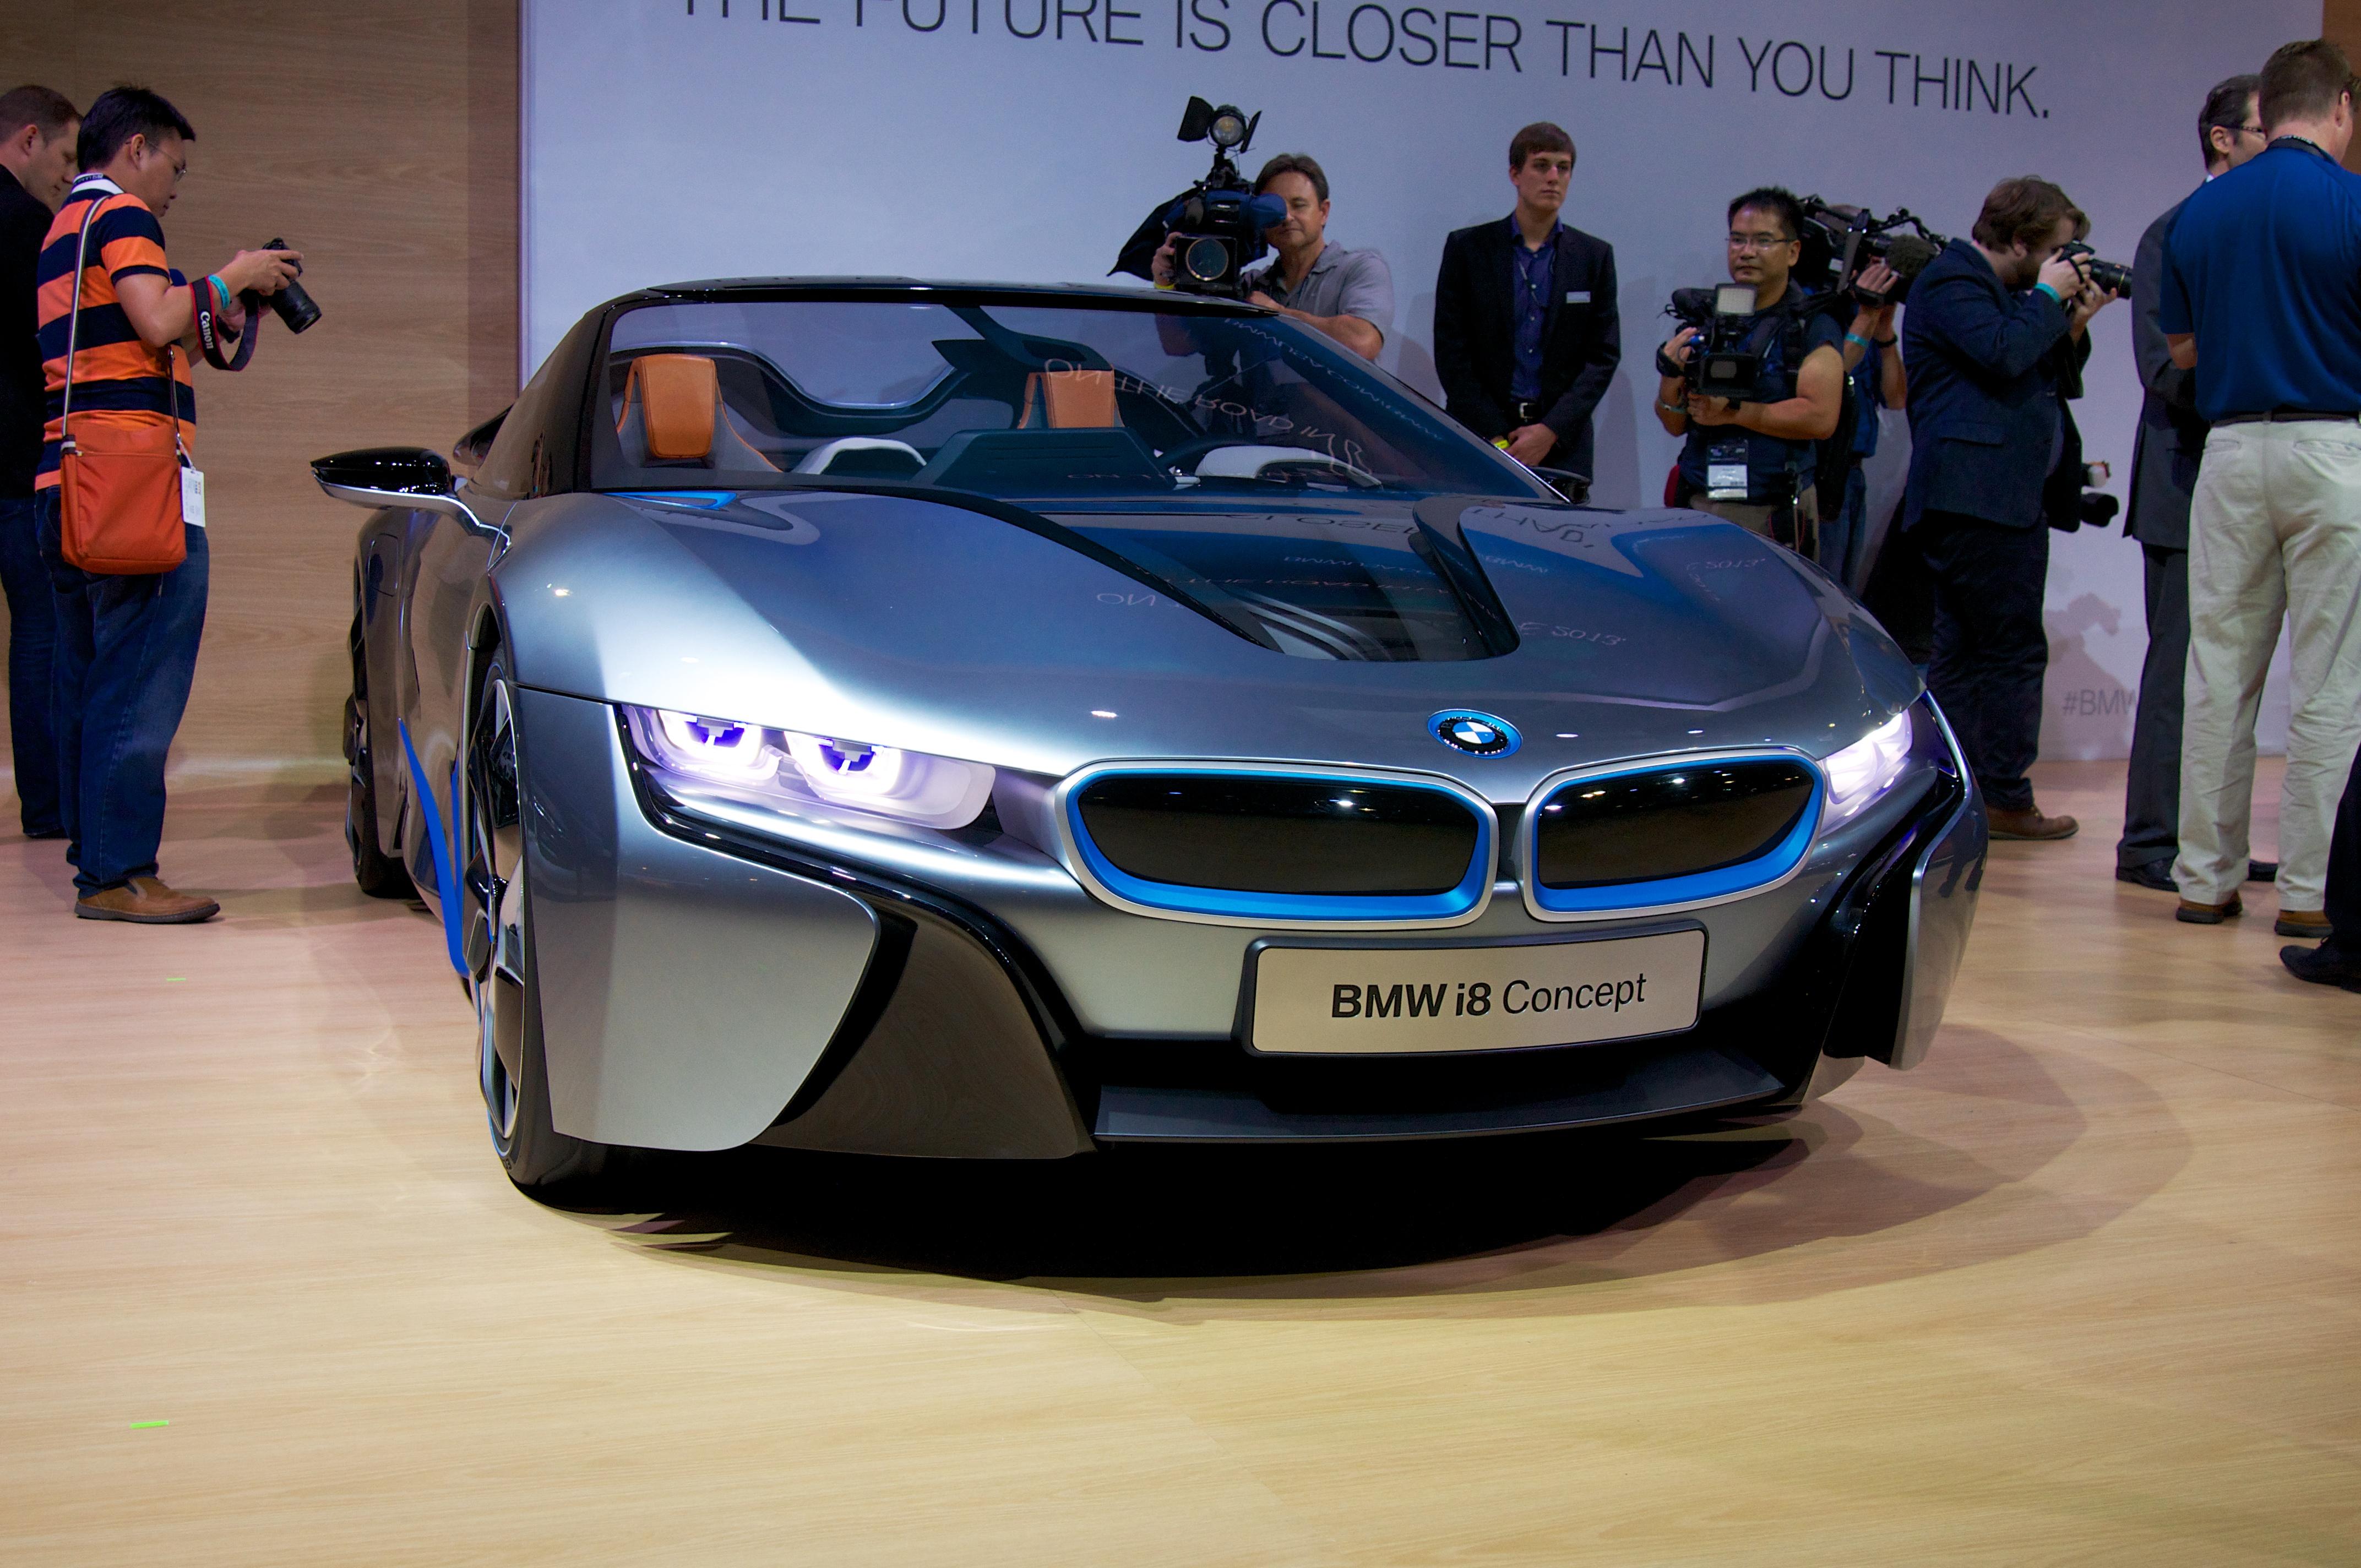 File:BMW i8 Concept 2012 LA Show.jpg - Wikimedia Commons